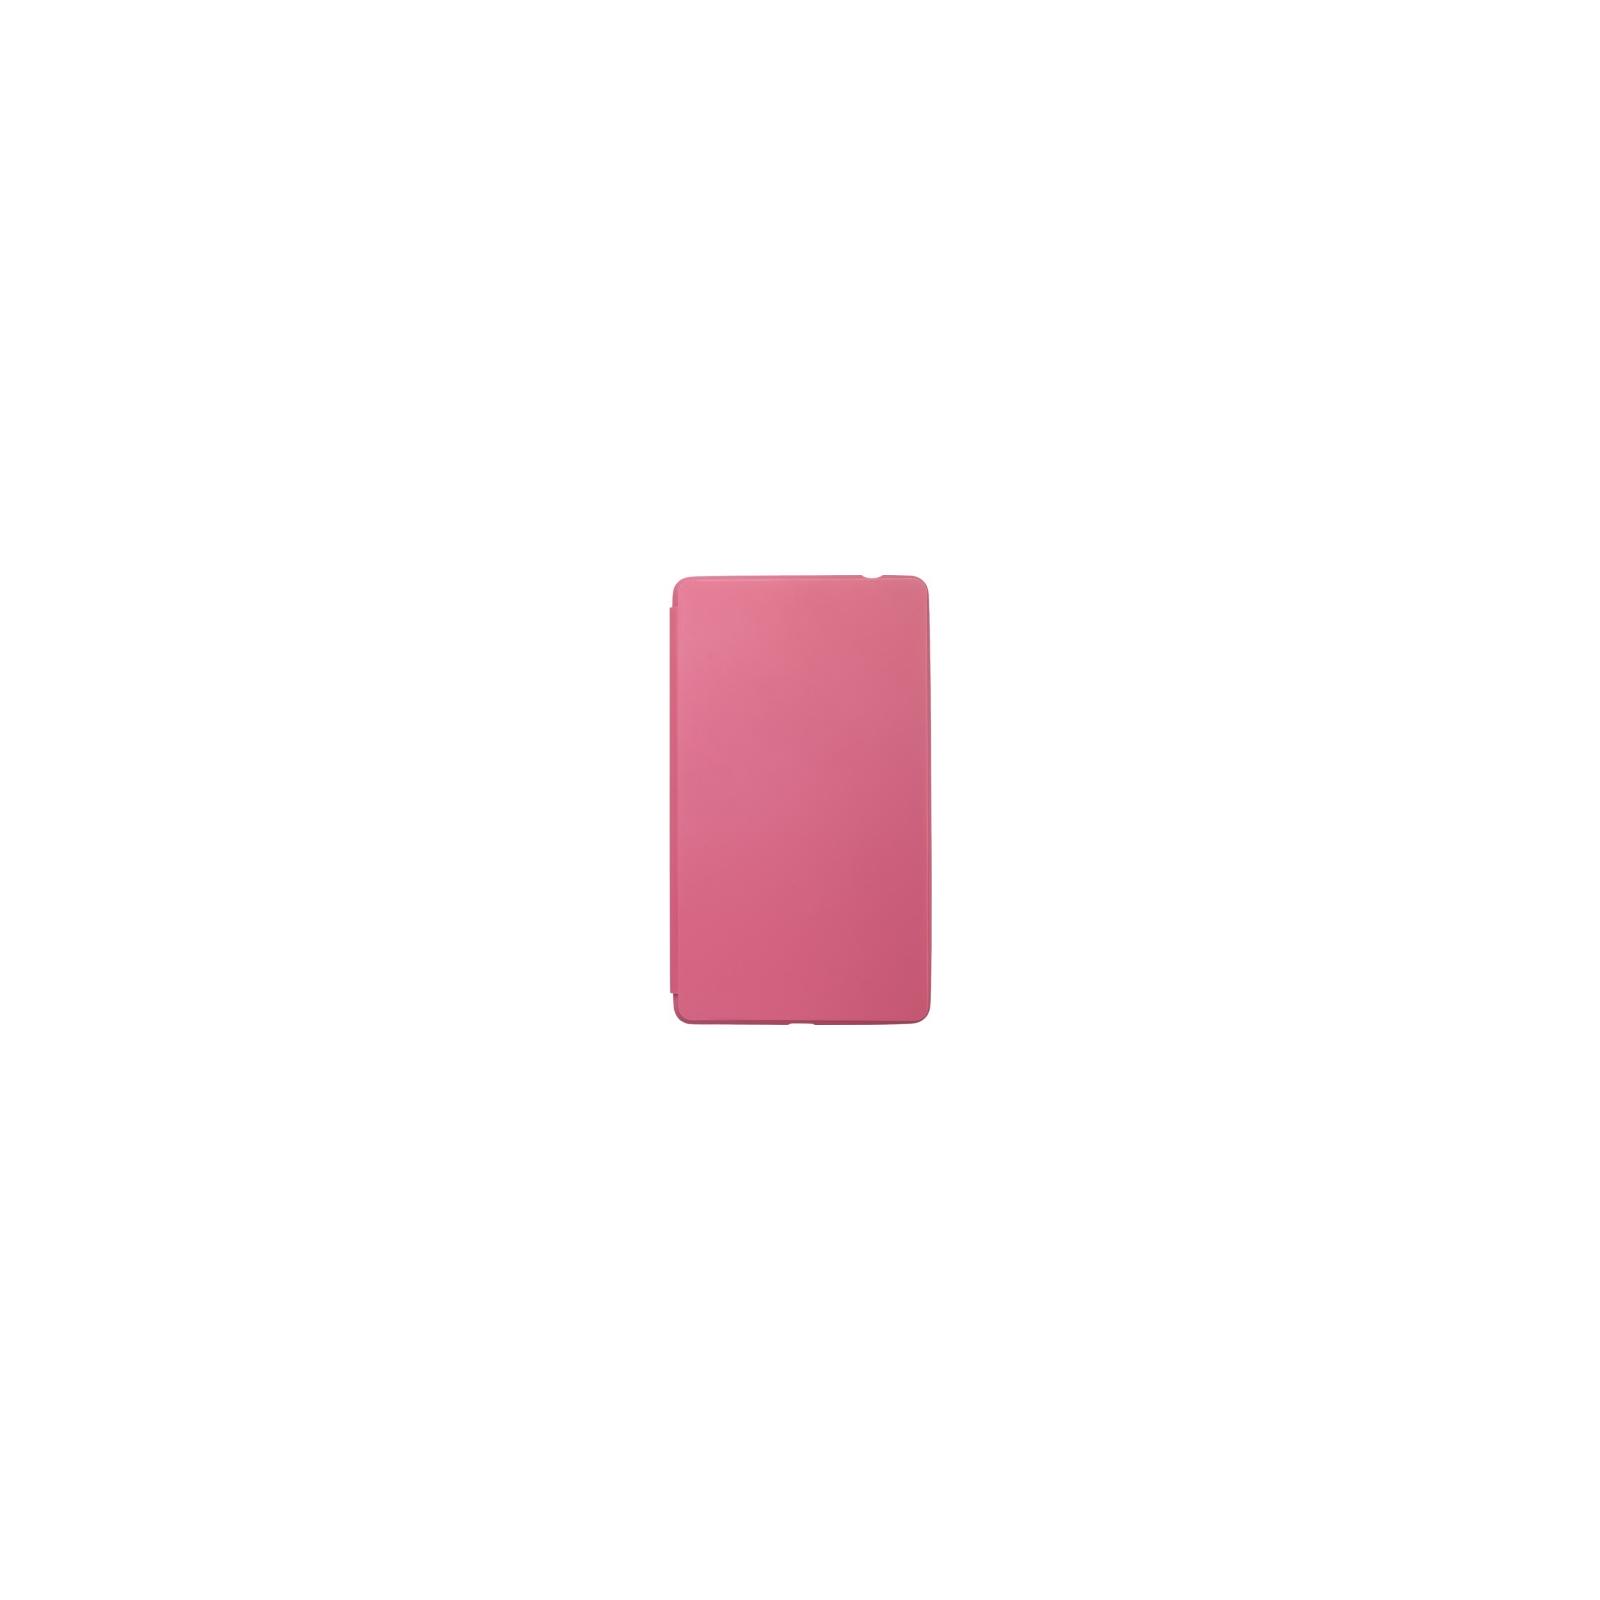 Чехол для планшета ASUS Nexus 7 2013 TRAVEL COVER V2 PINK (90-XB3TOKSL001P0-)